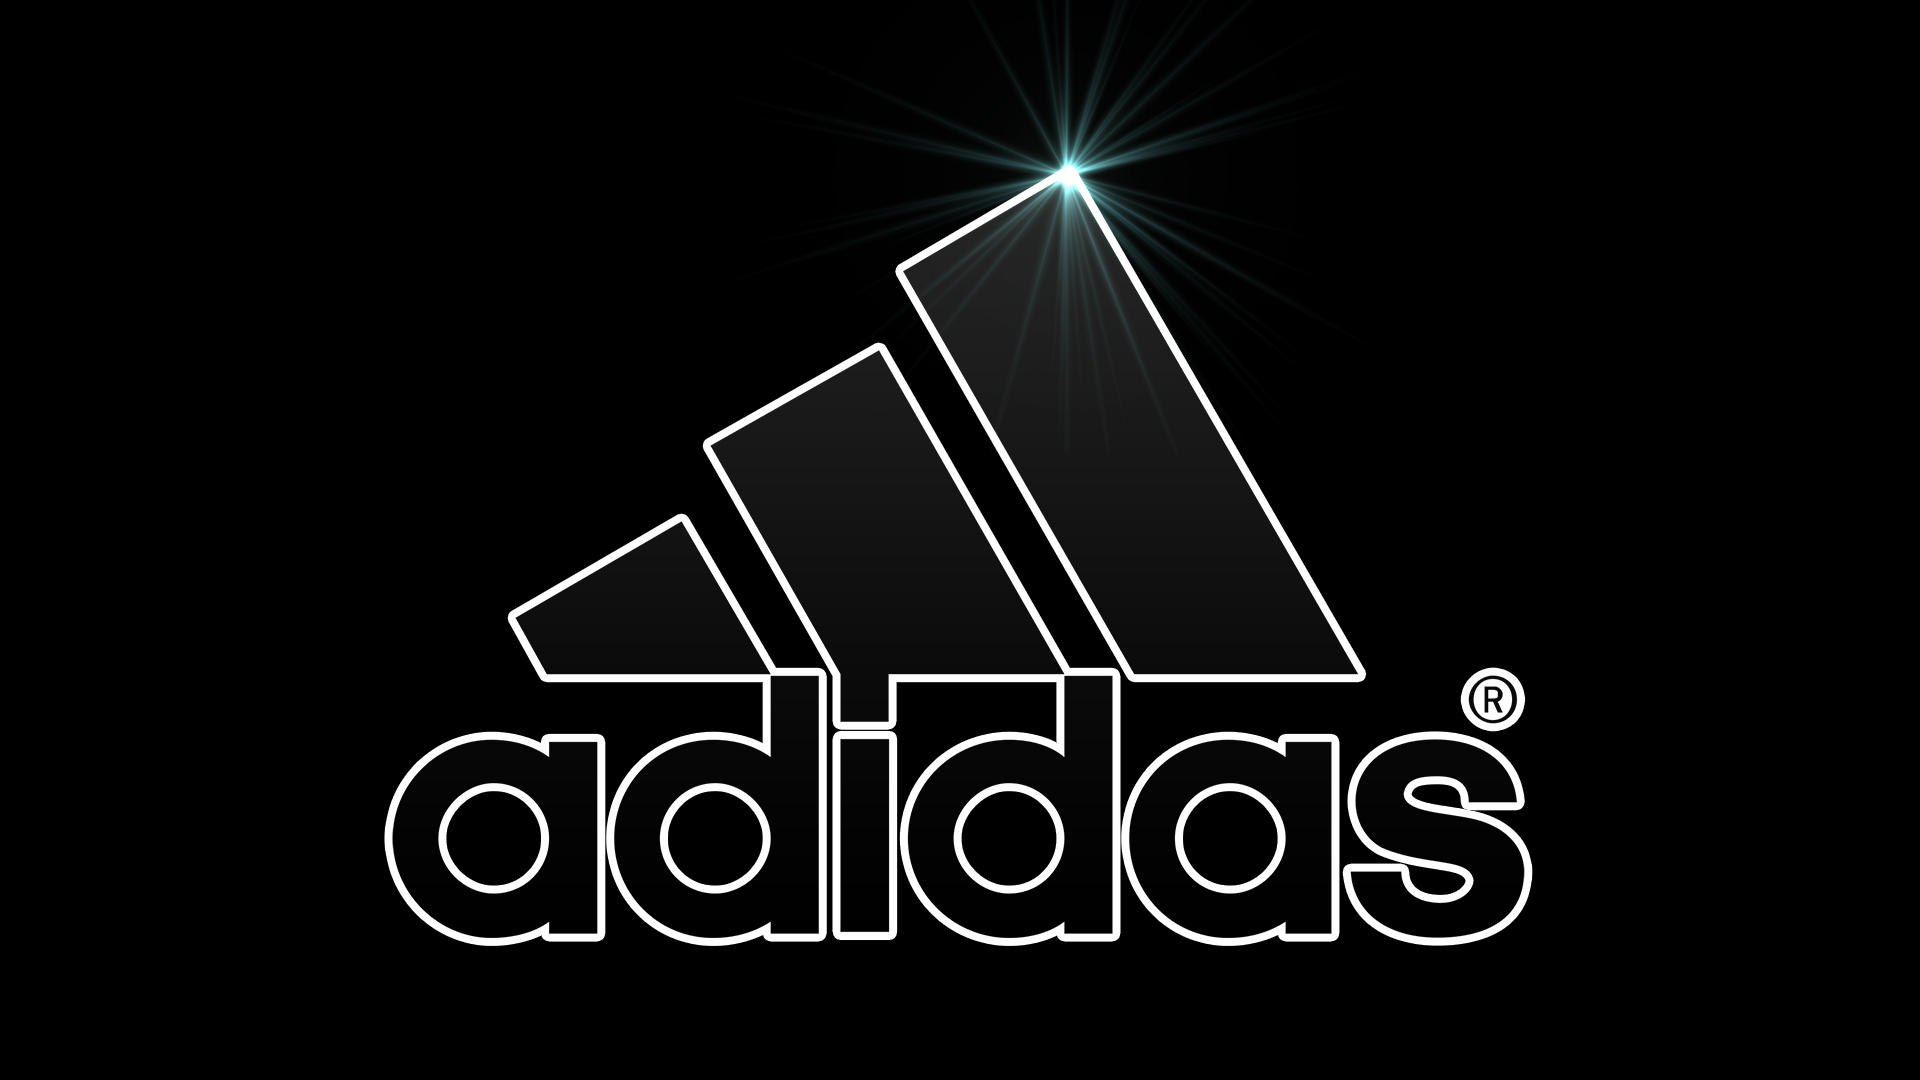 Adidas Logo Hd Wallpaper Background Image 1920x1080 Id